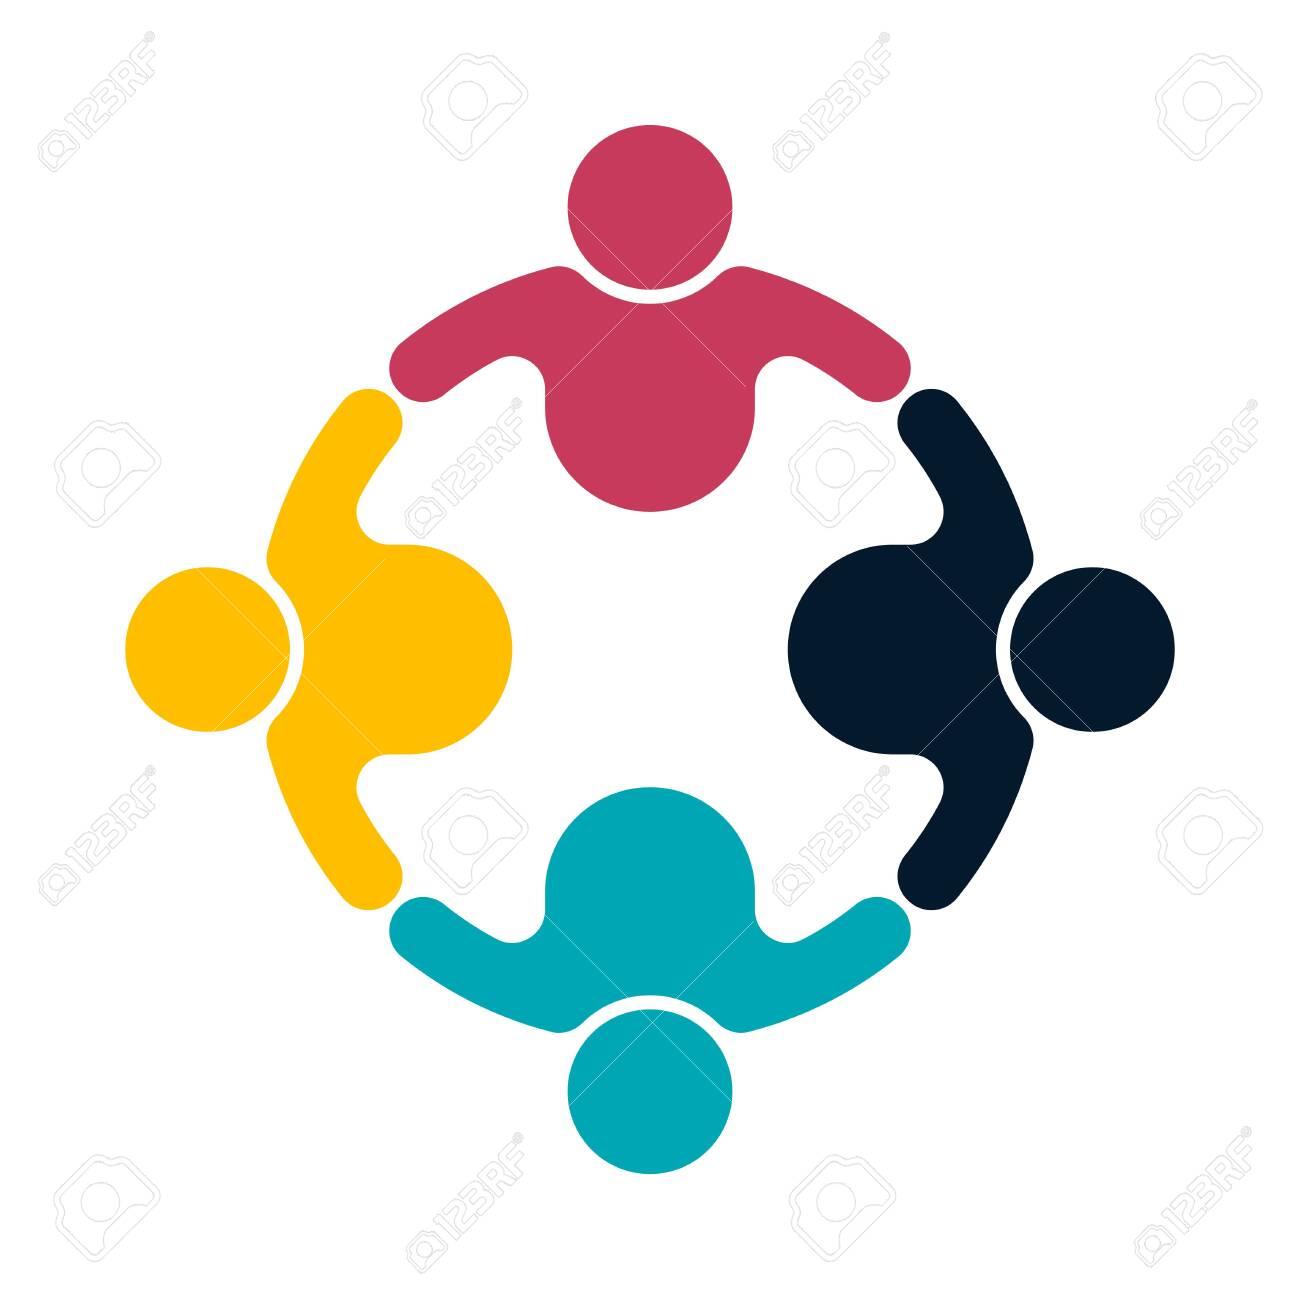 Group people logo handshake in a circle, teamwork icon, vector illustrator - 125105909